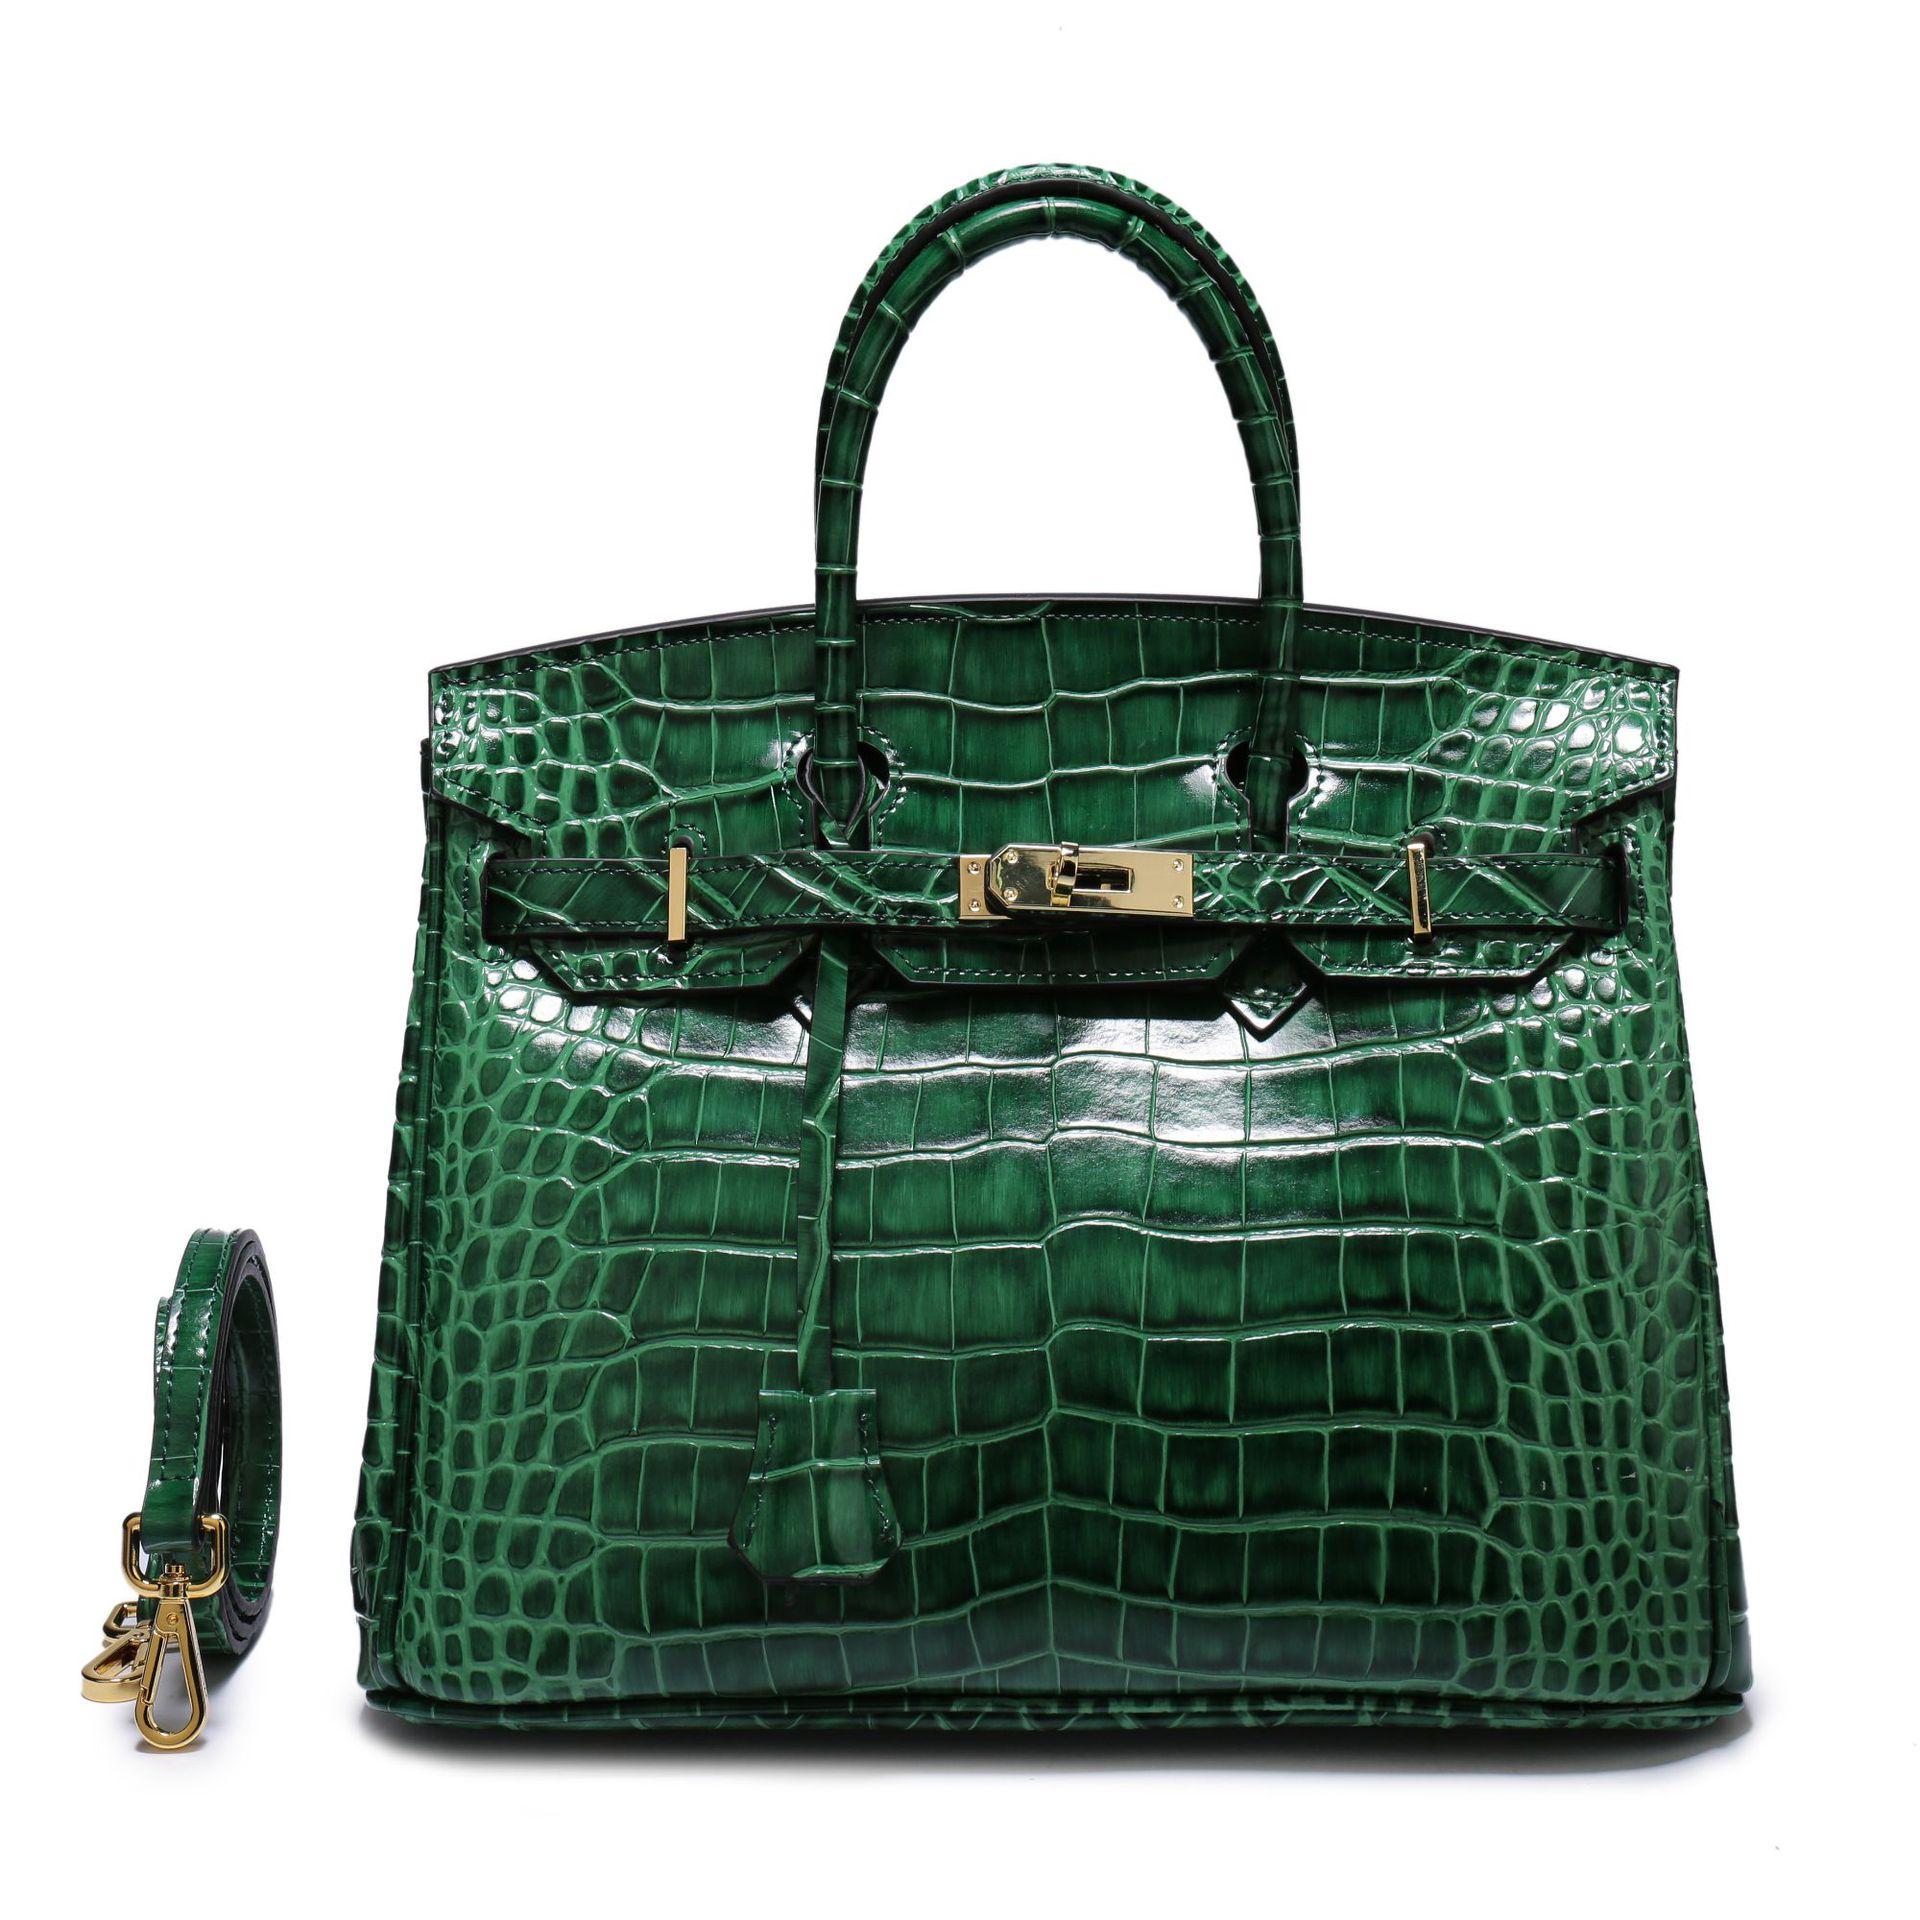 Schoudertas Bolsos Para Mujer Damen Taschen Genuine Leather Crocodile Pattern Bags Cross Body Bag for Women Womens HandbagsSchoudertas Bolsos Para Mujer Damen Taschen Genuine Leather Crocodile Pattern Bags Cross Body Bag for Women Womens Handbags